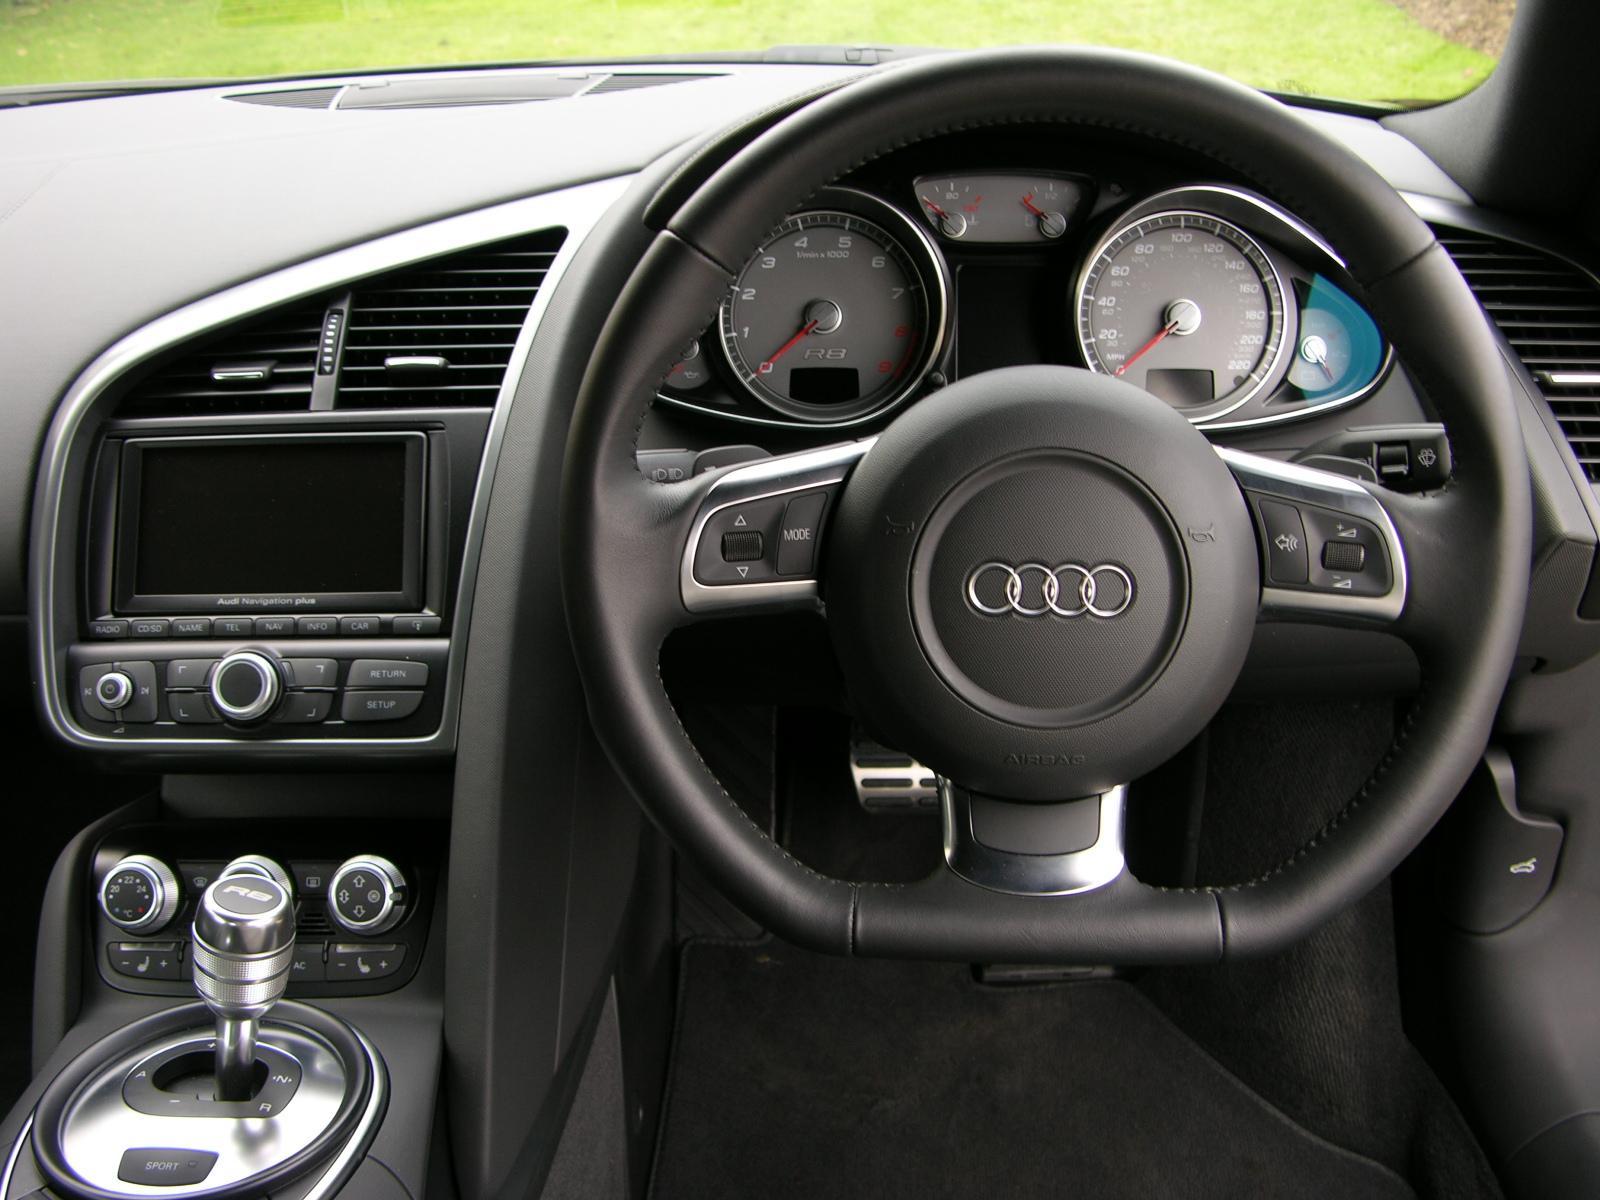 File:2008 Audi R8 - Flickr - The Car Spy (6).jpg